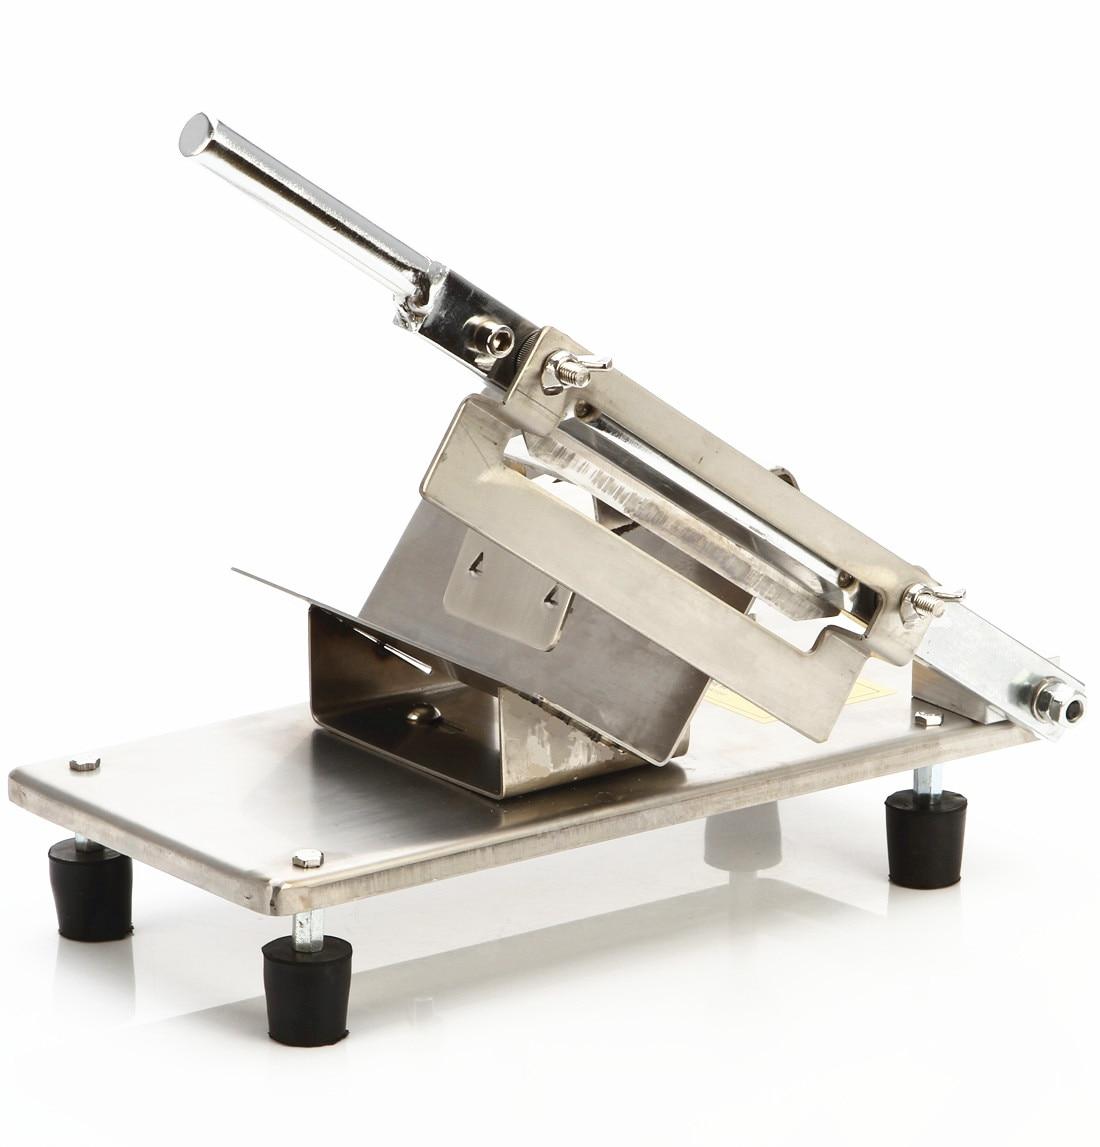 Manual Meat slicer Home meat grinder Commercial cooking appliances